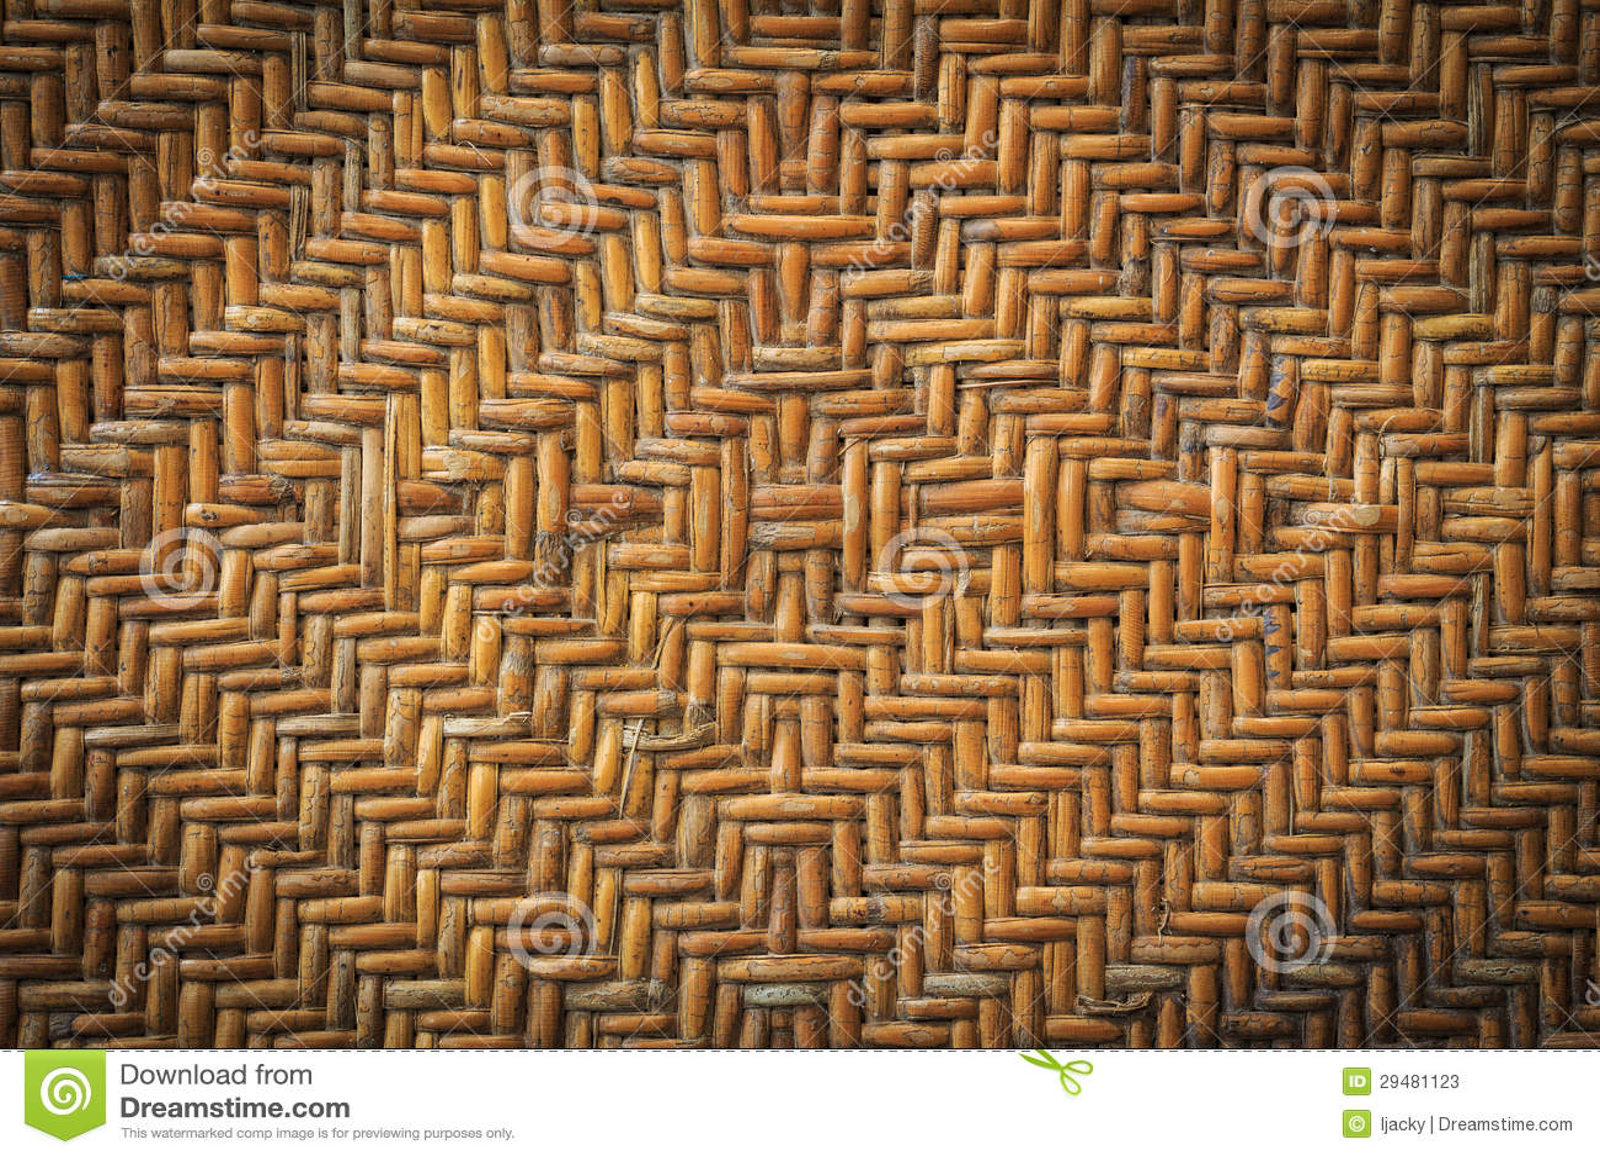 old handcraft rattan weave stock photos